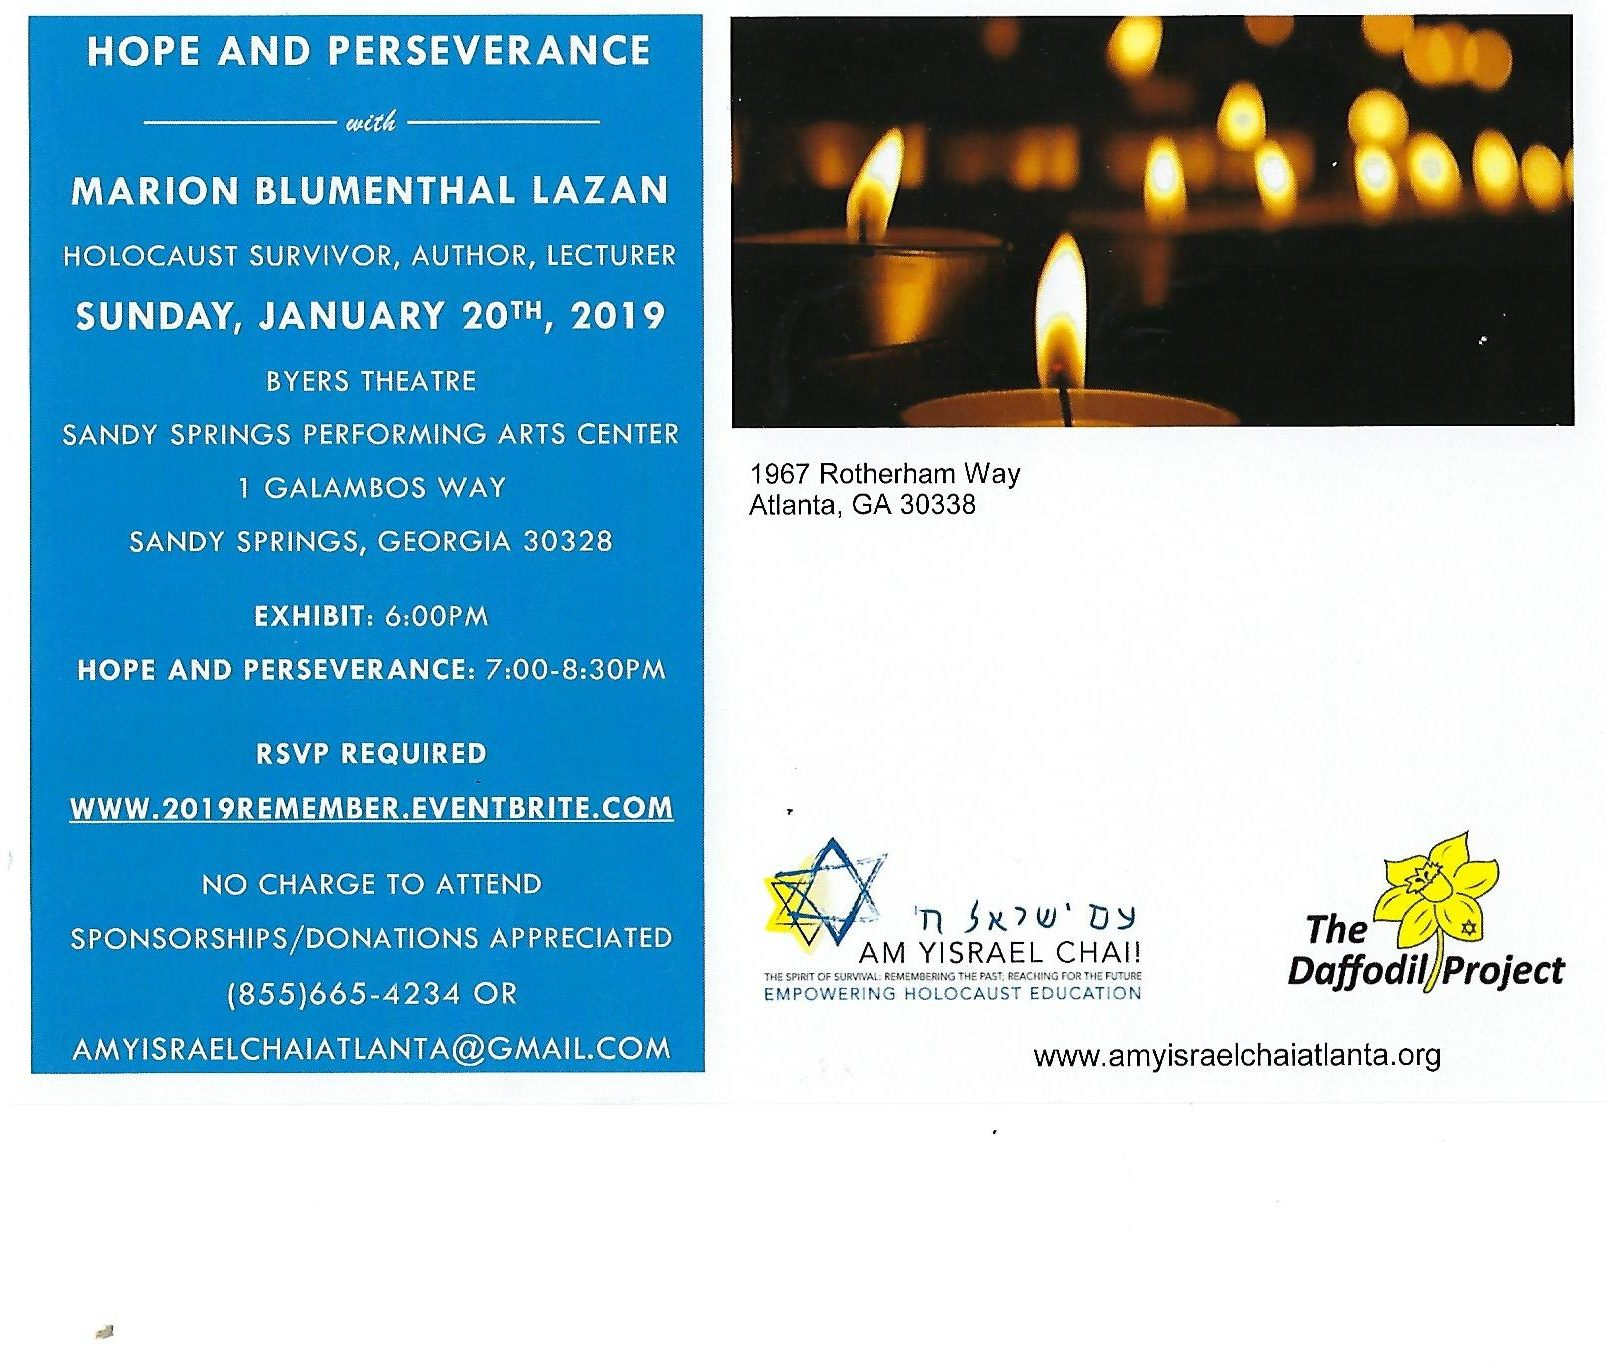 Am Yisrael Chai, International Holocaust Day, Atlanta, GA Keynote Speaker